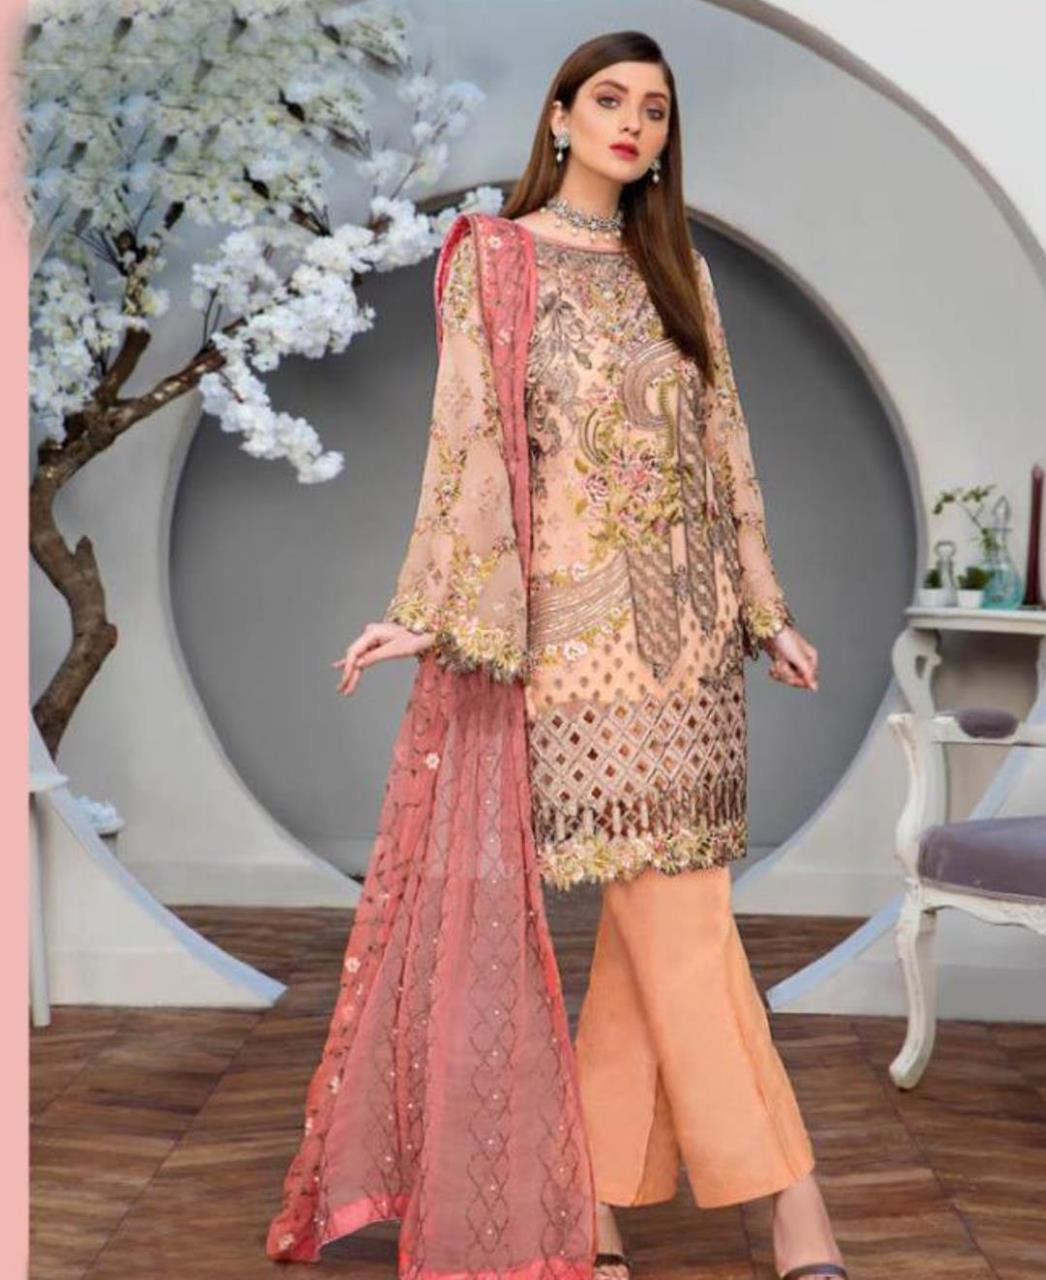 Embroidered Georgette Straight cut Salwar Kameez in Light Orange